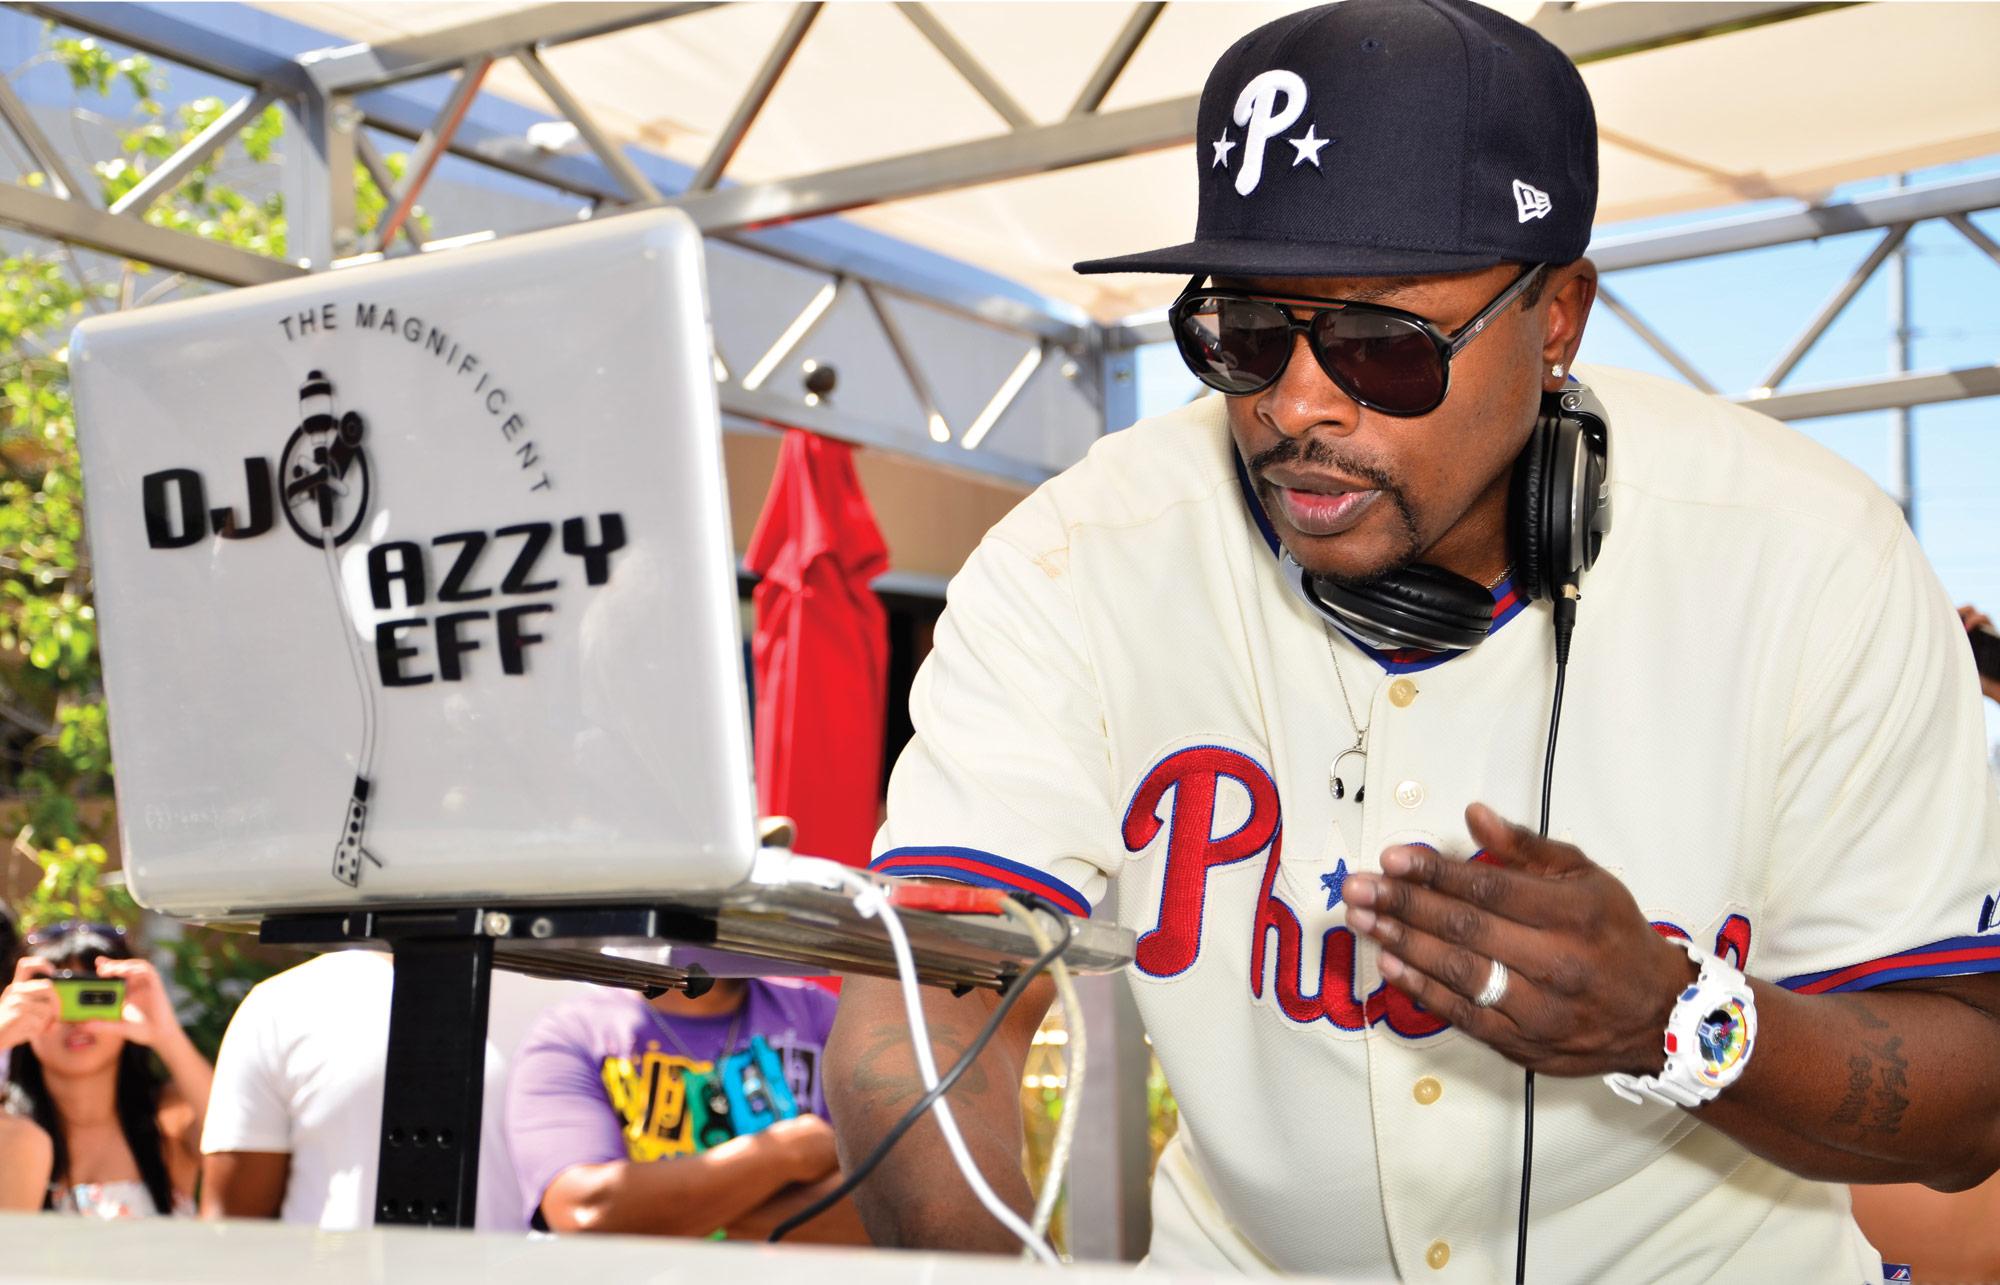 DJ Jazzy Jeff To Headline 'Camden Rising' Concert at DNC July 28th